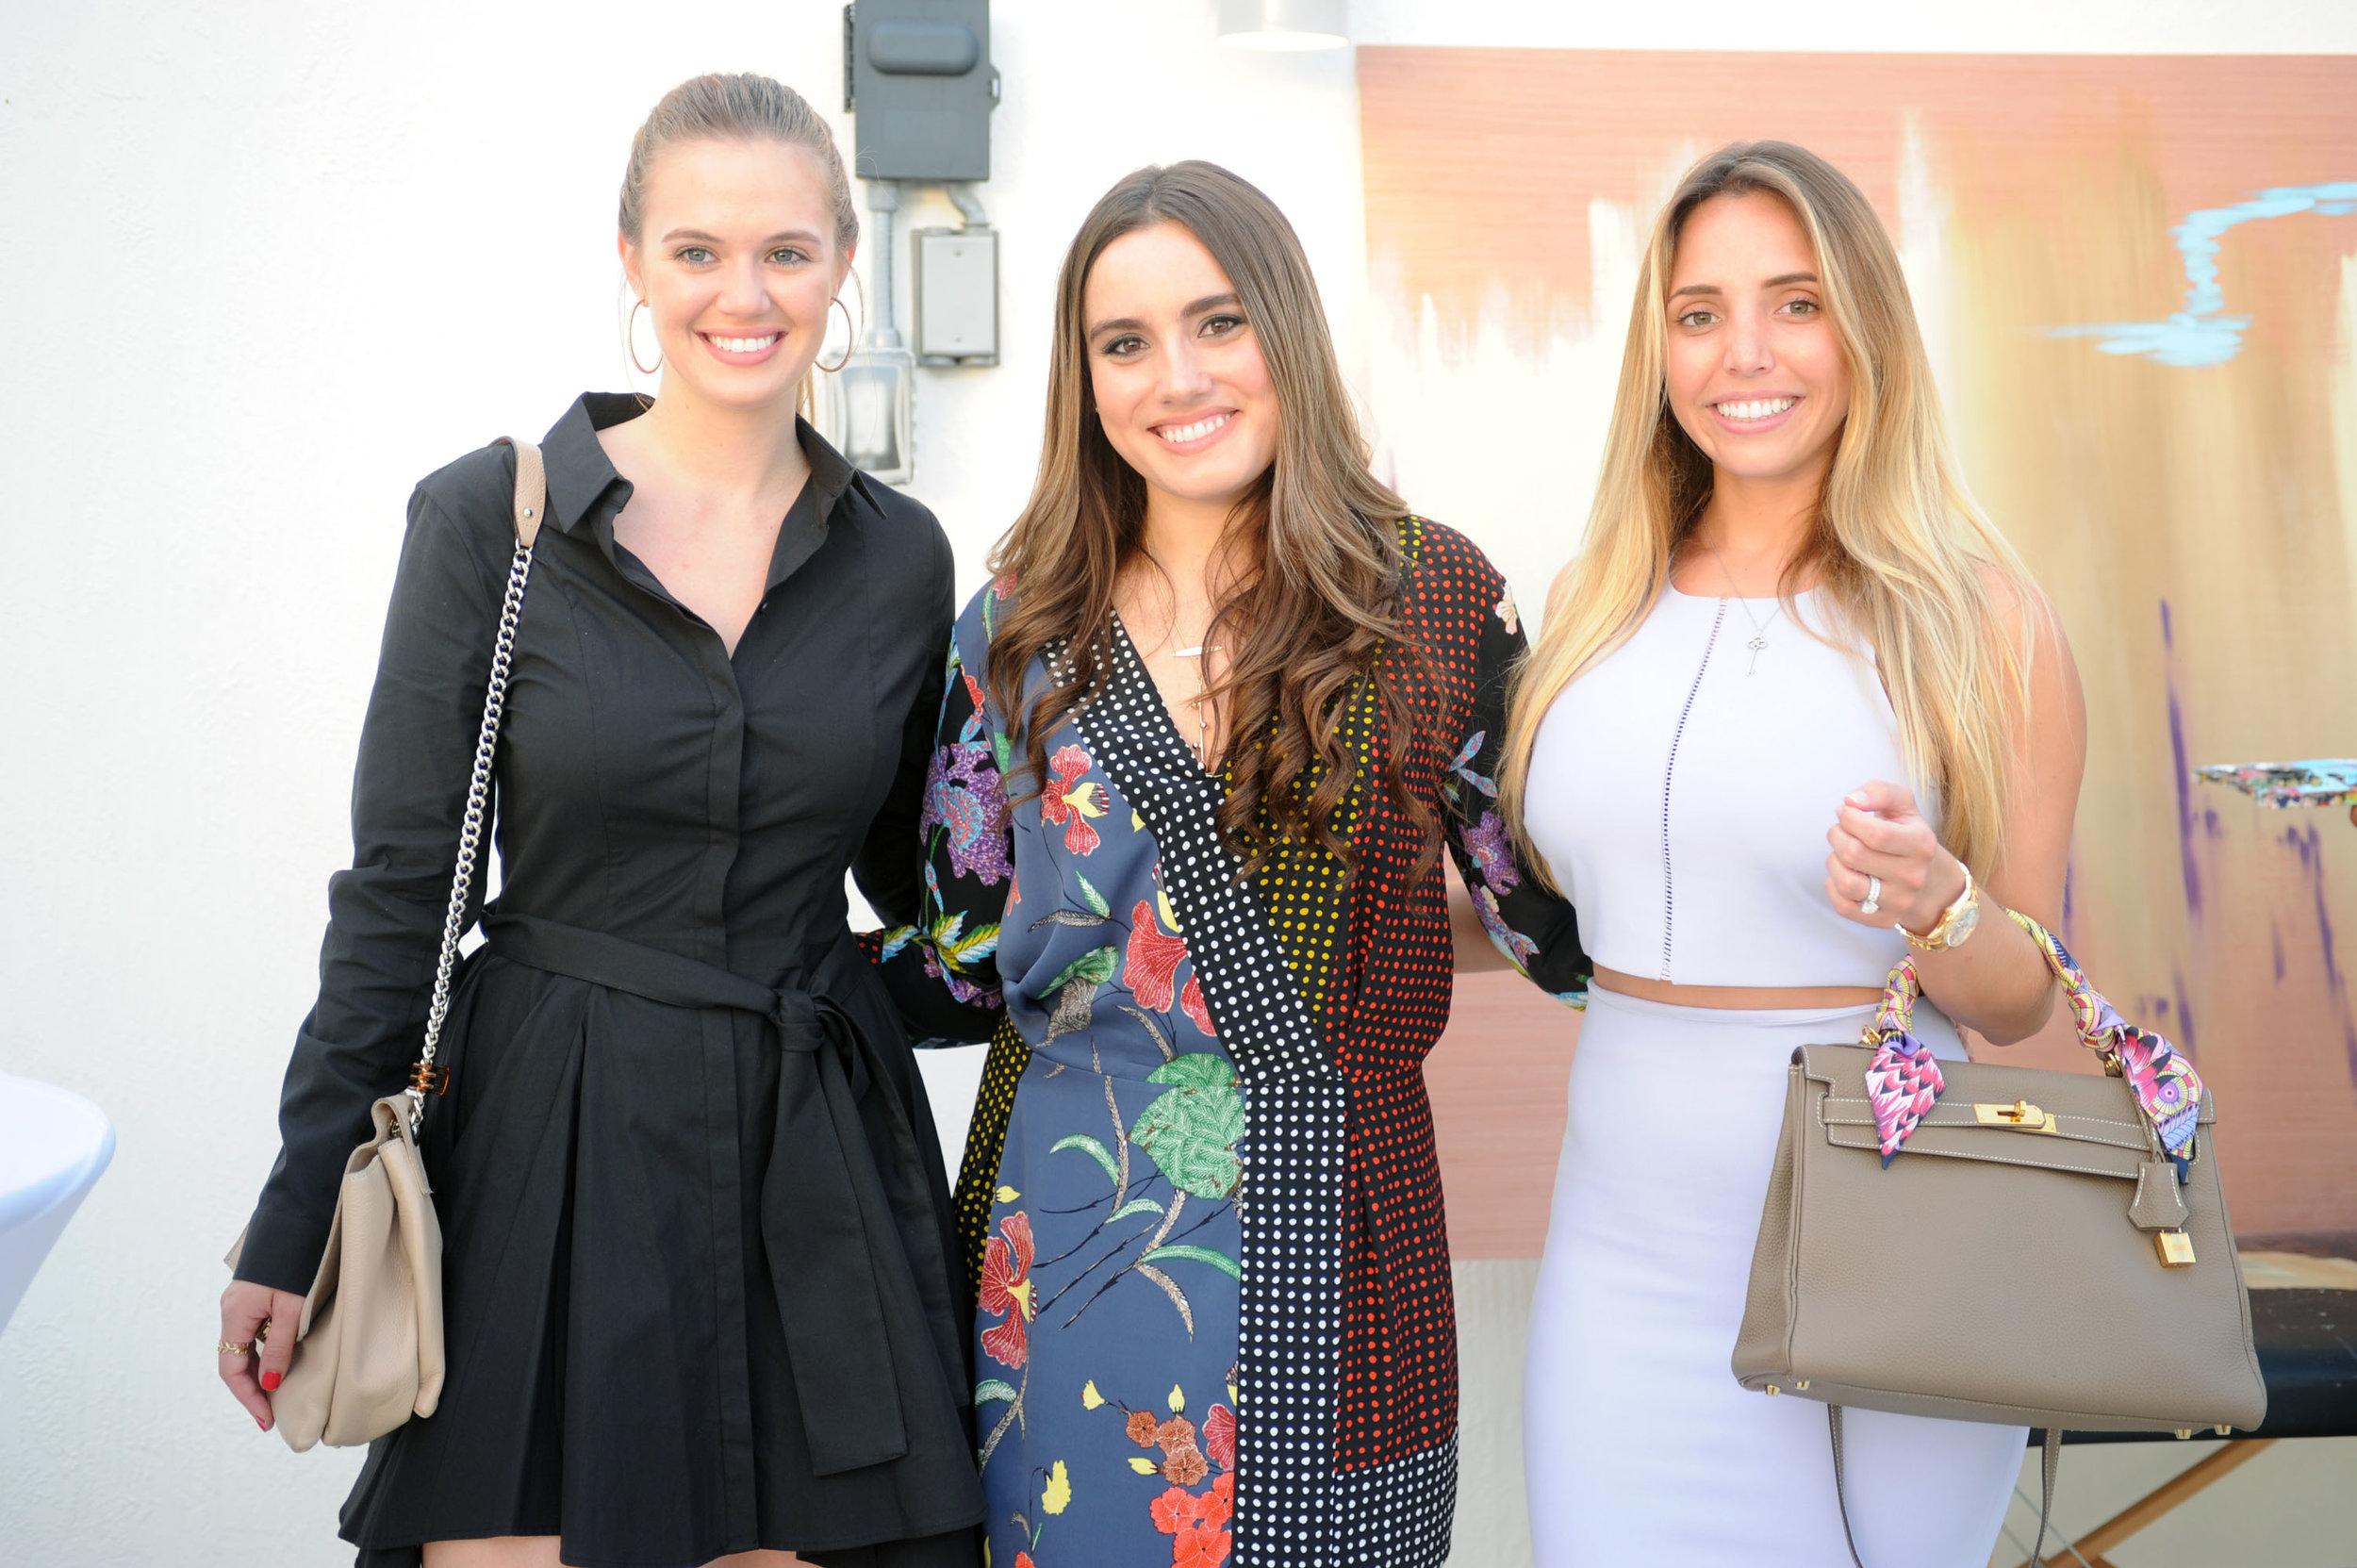 Charina Ferreira, Alexandra Muinos, & Crystal Ferreira.jpg